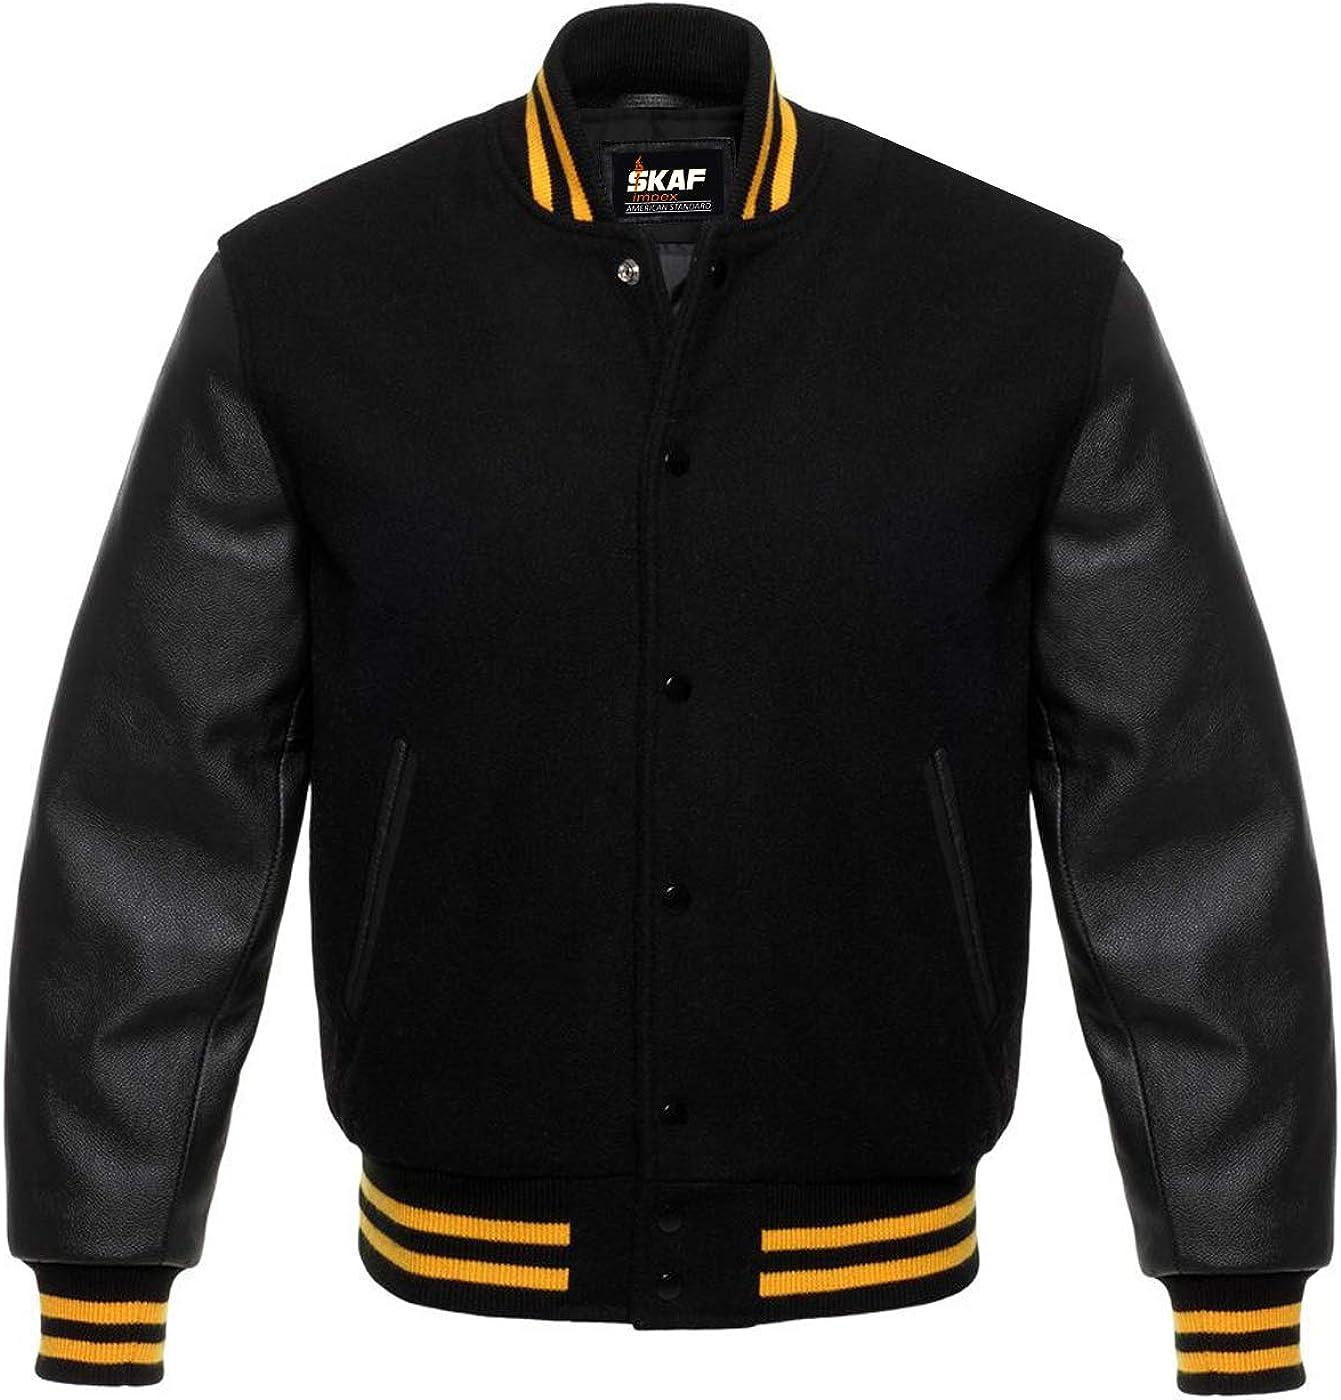 Skaf Impex American Baseball Letterman Bomber Sports Varsity Jacket Wool & Genuine Cow Leather XS~7XL